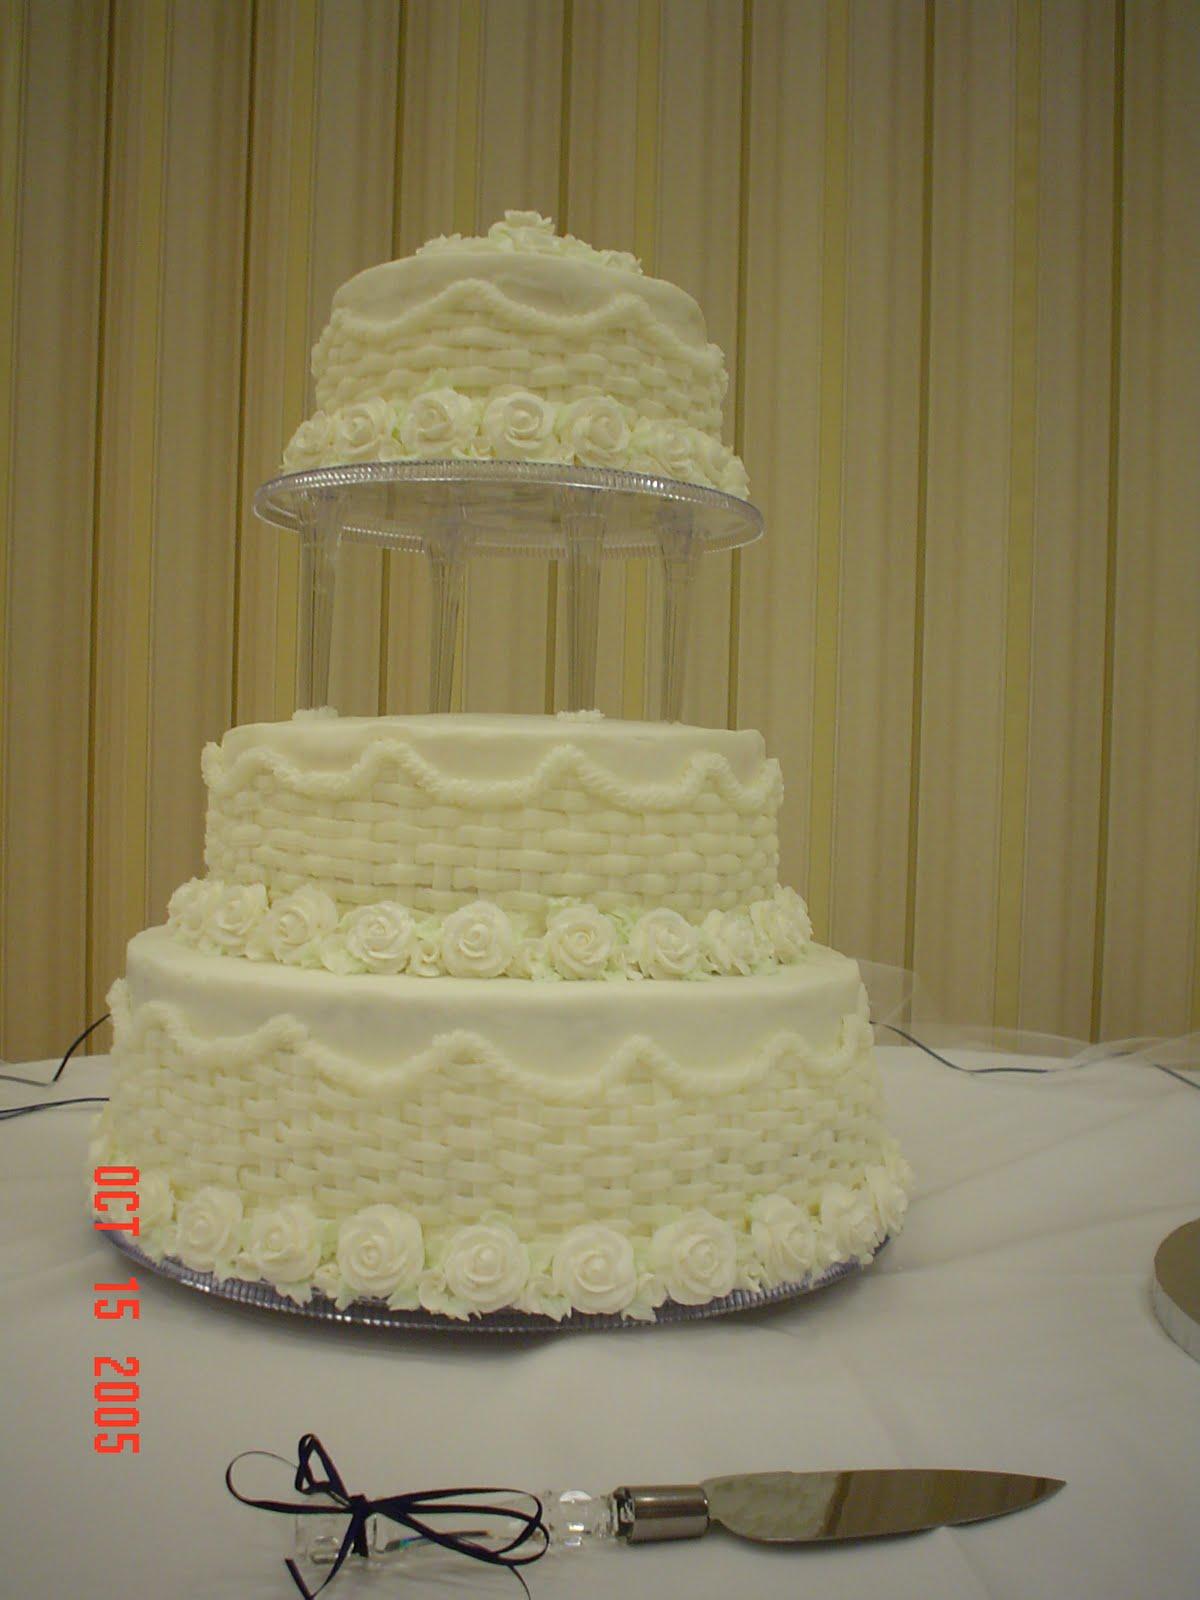 White Wedding Cake With Pillars 3 Tier